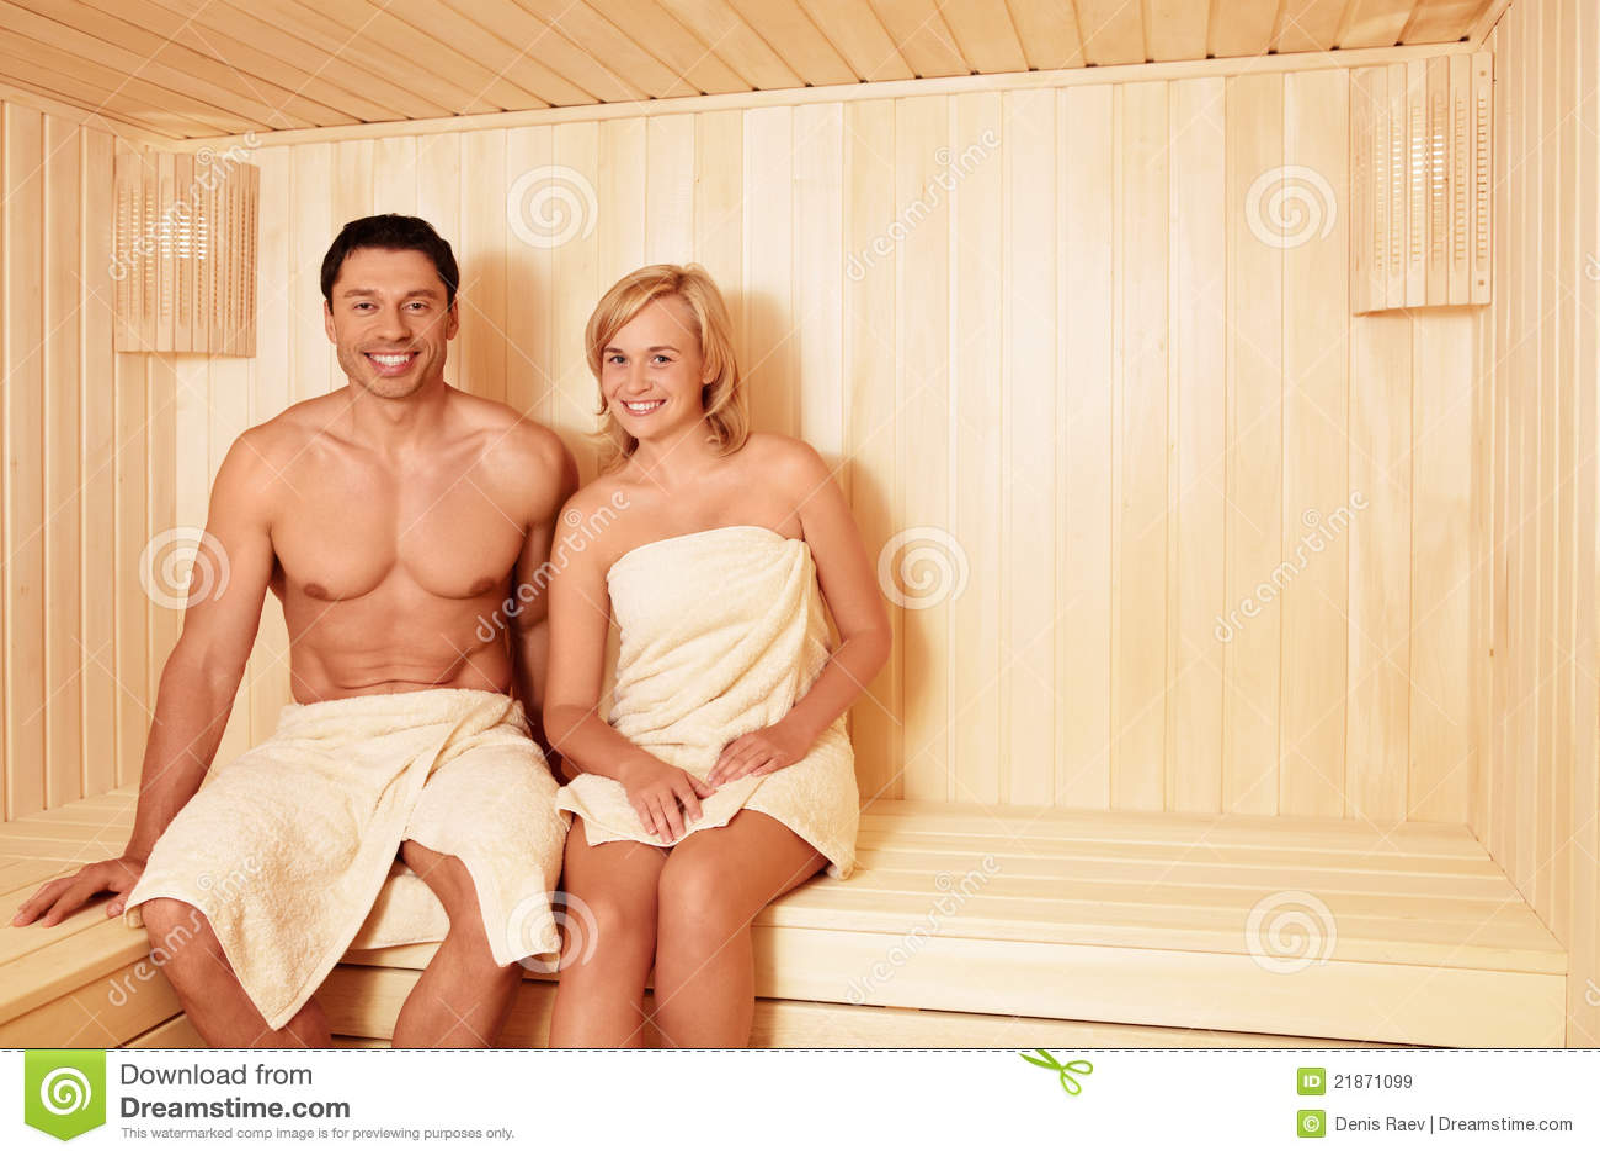 Пары семейные в бане